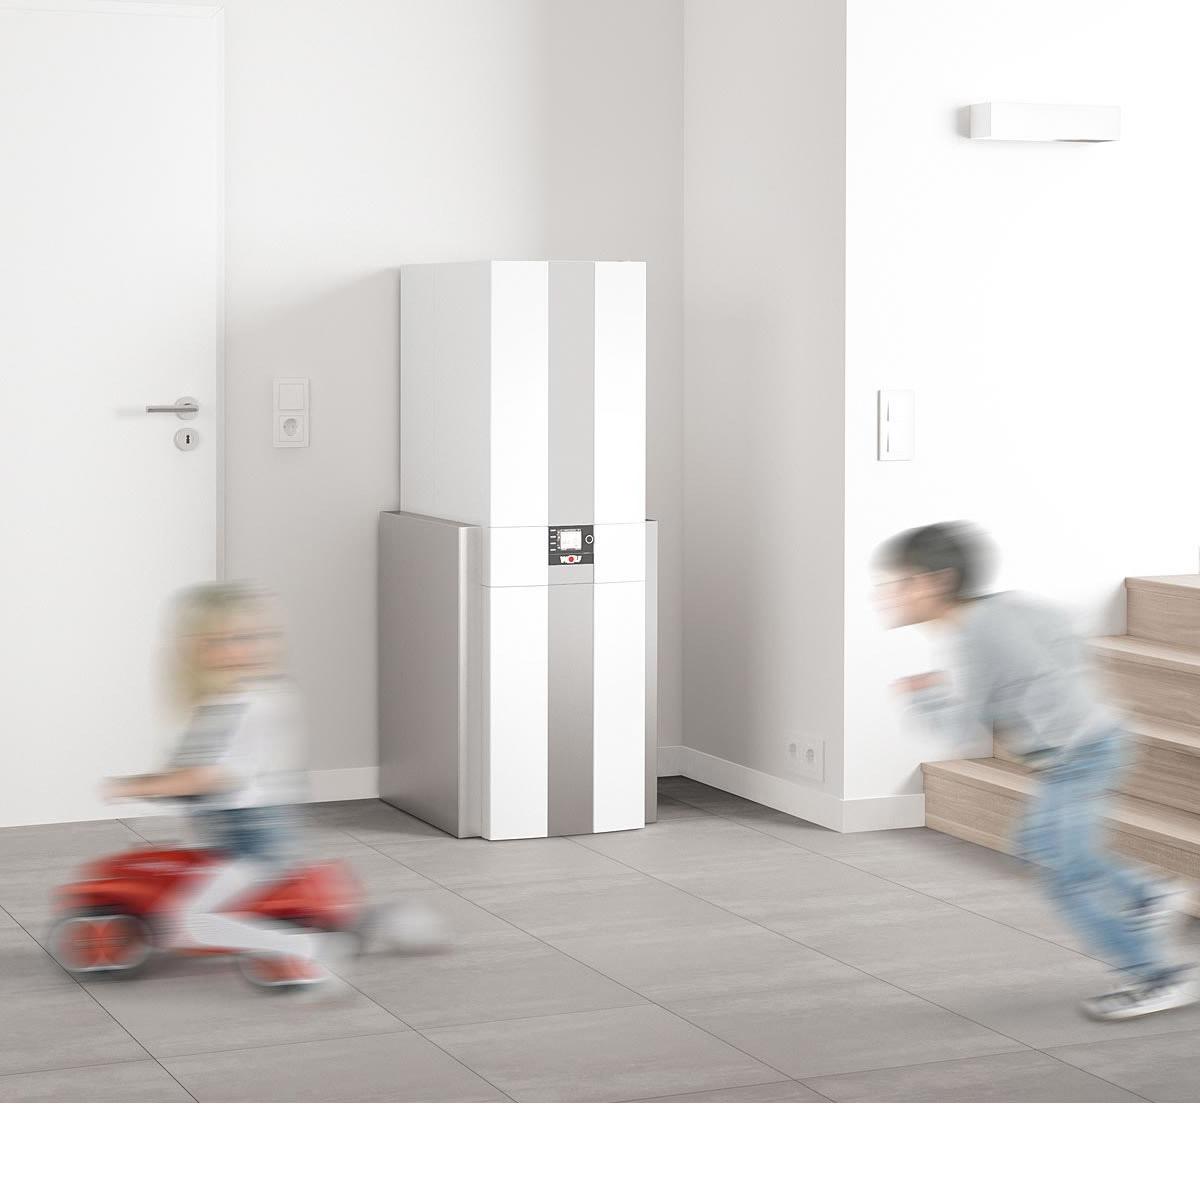 wolf gasbrennwert zentrale cgs 2 20 kw 160l optional mit bedienmodul bm 2 8615015 heizung. Black Bedroom Furniture Sets. Home Design Ideas